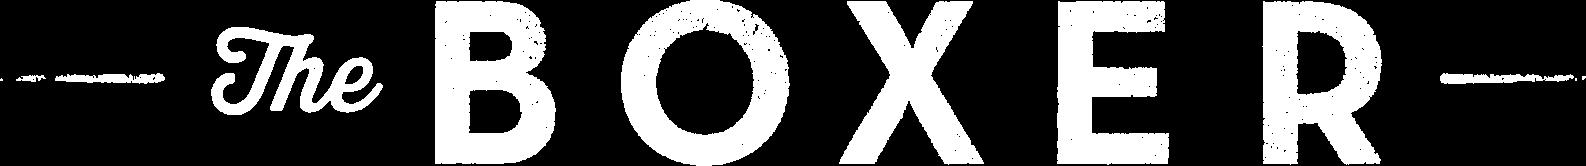 boxer hotel logo